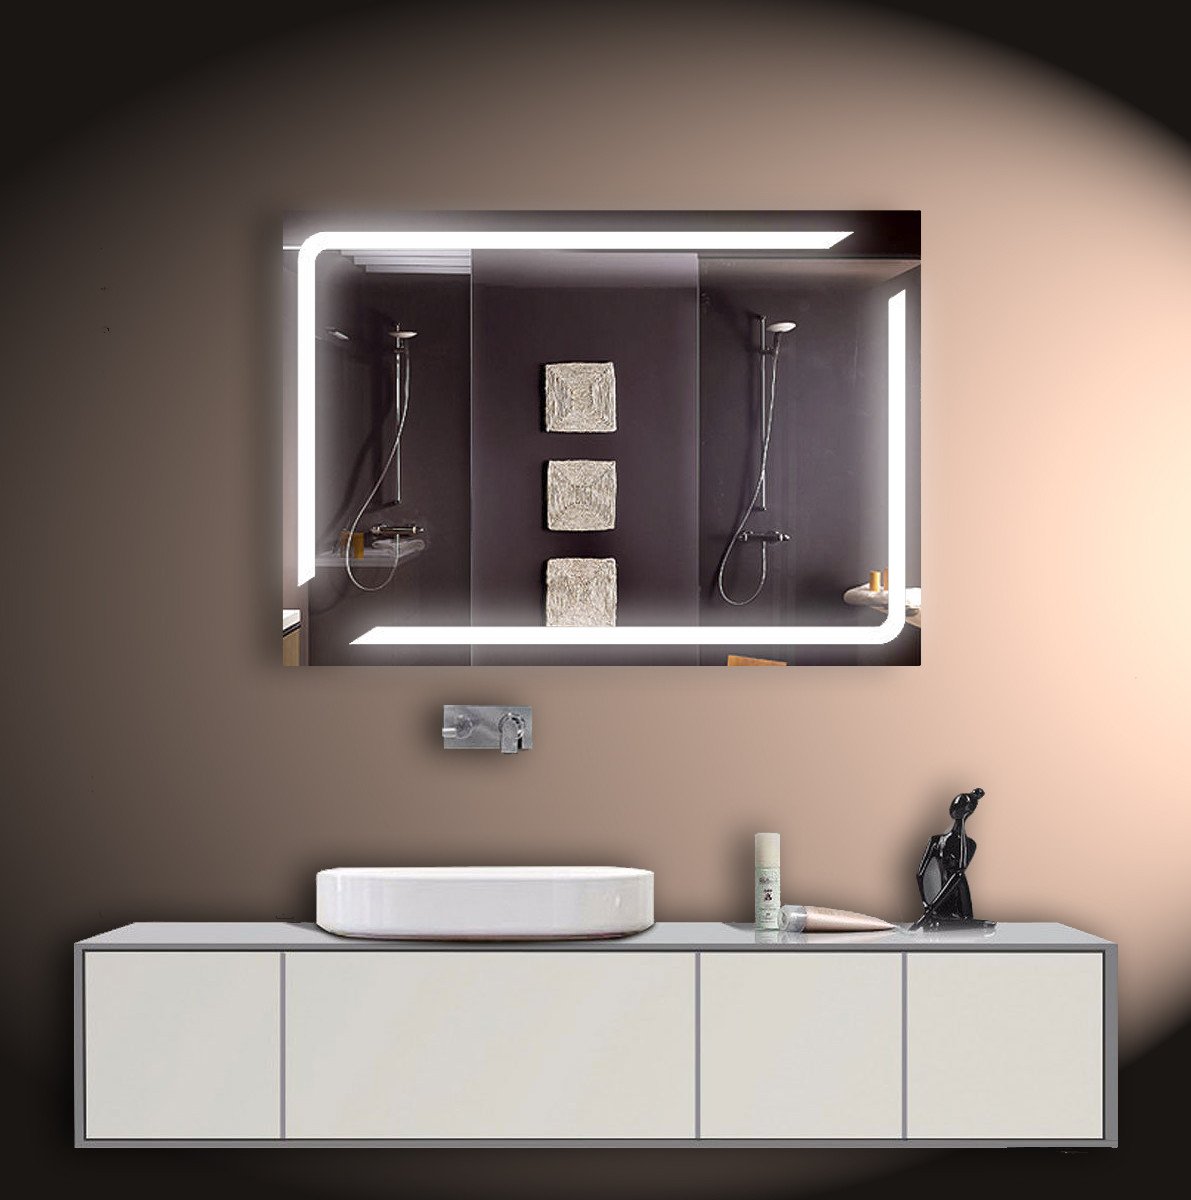 Зеркало LED со светодиодной подсветкой ver-3073 1000х700 мм